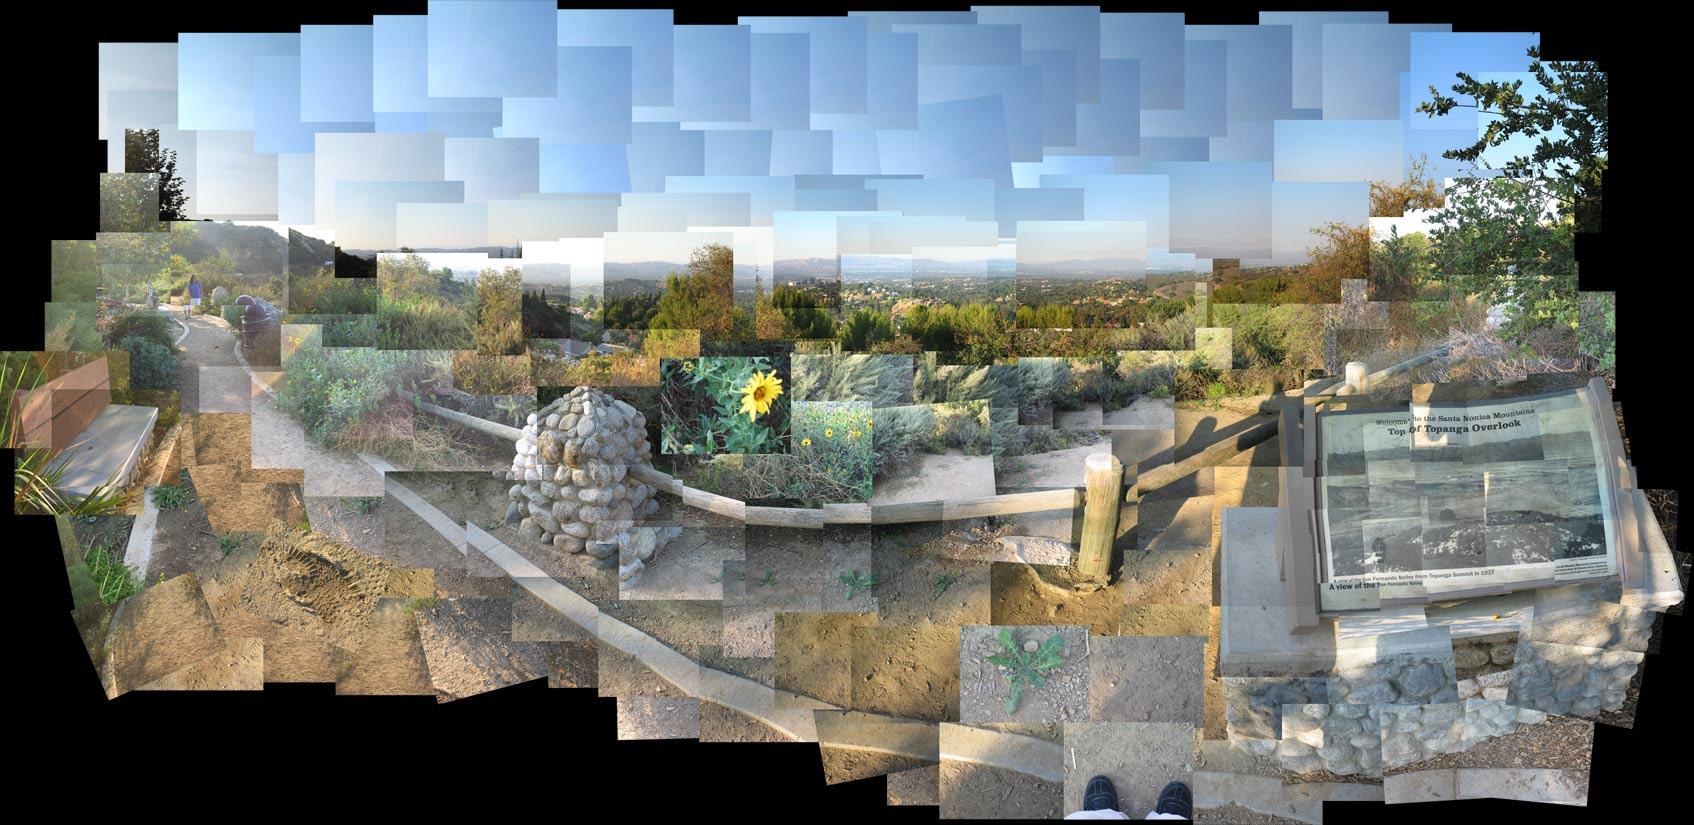 Topanga-Canyon-David-Hockney